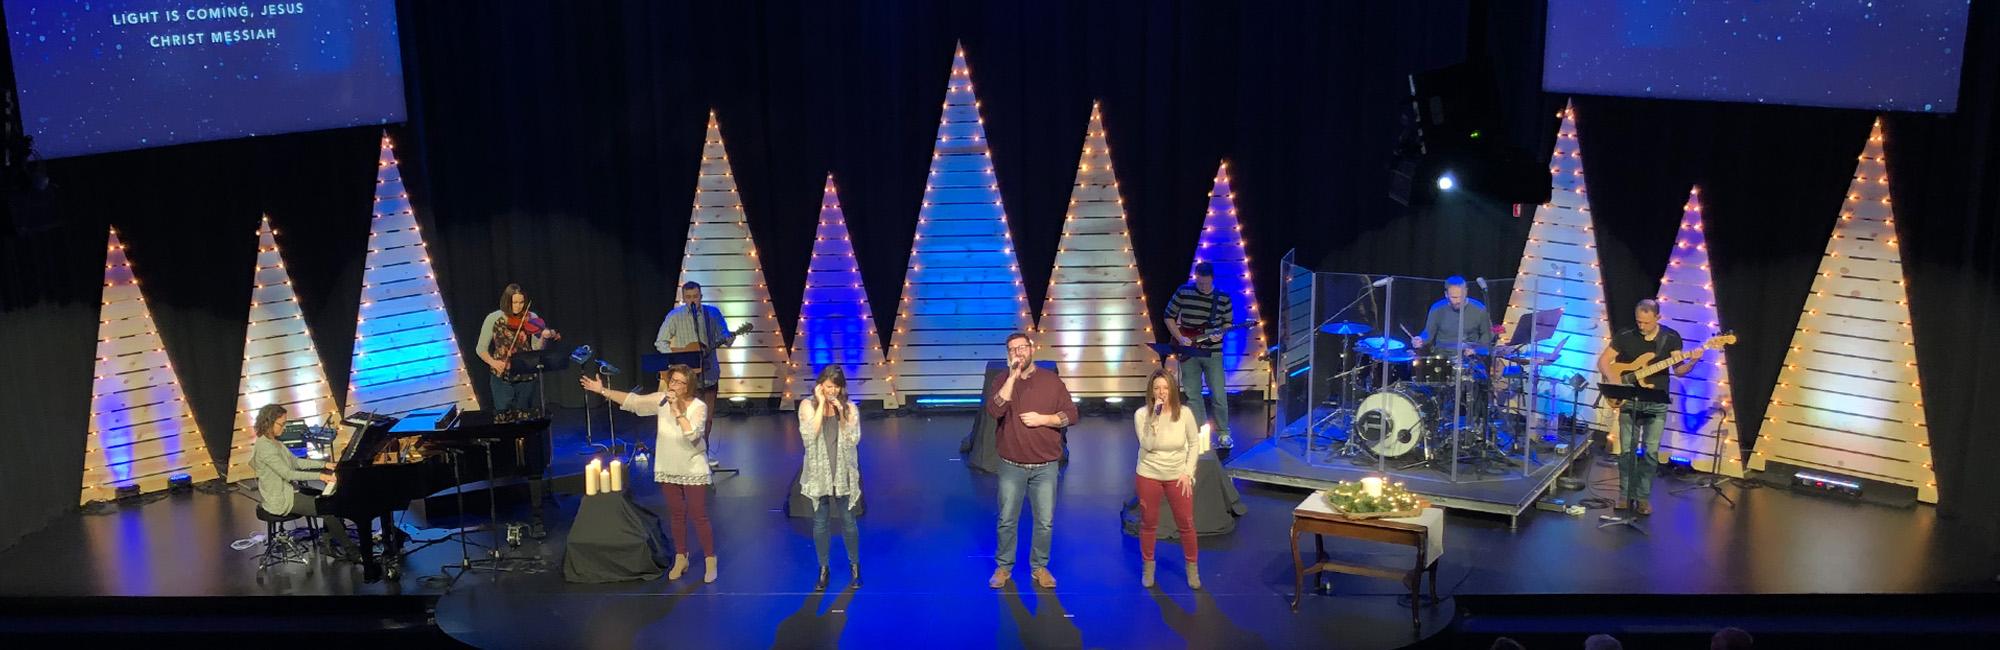 Christmas 2018 - Sermon Web Header (worship service)